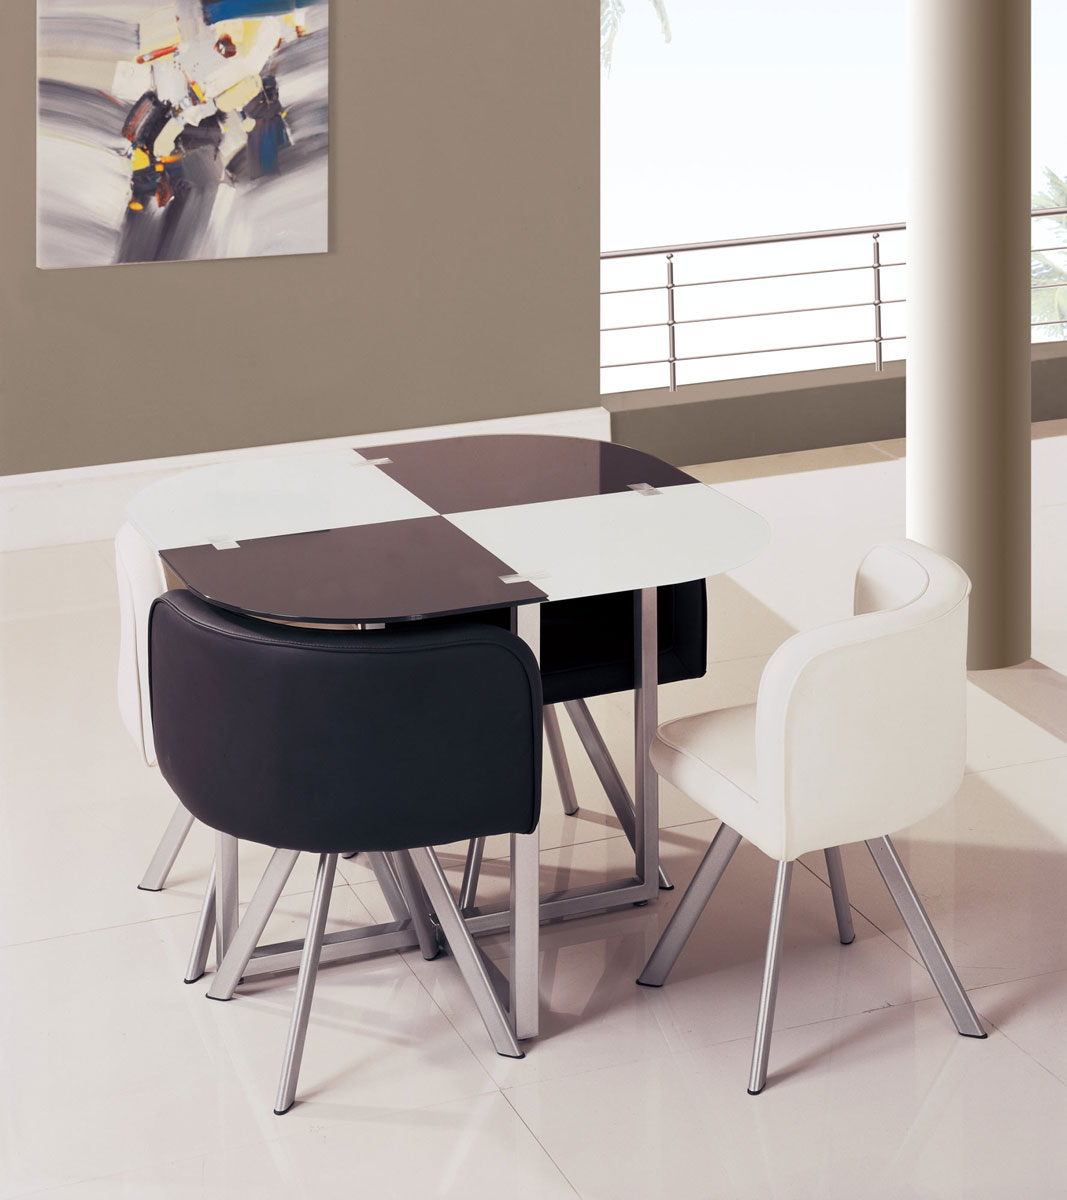 Global Furniture USA 536-1DT Dining Set - Vinyl/Black/White - Metal Legs